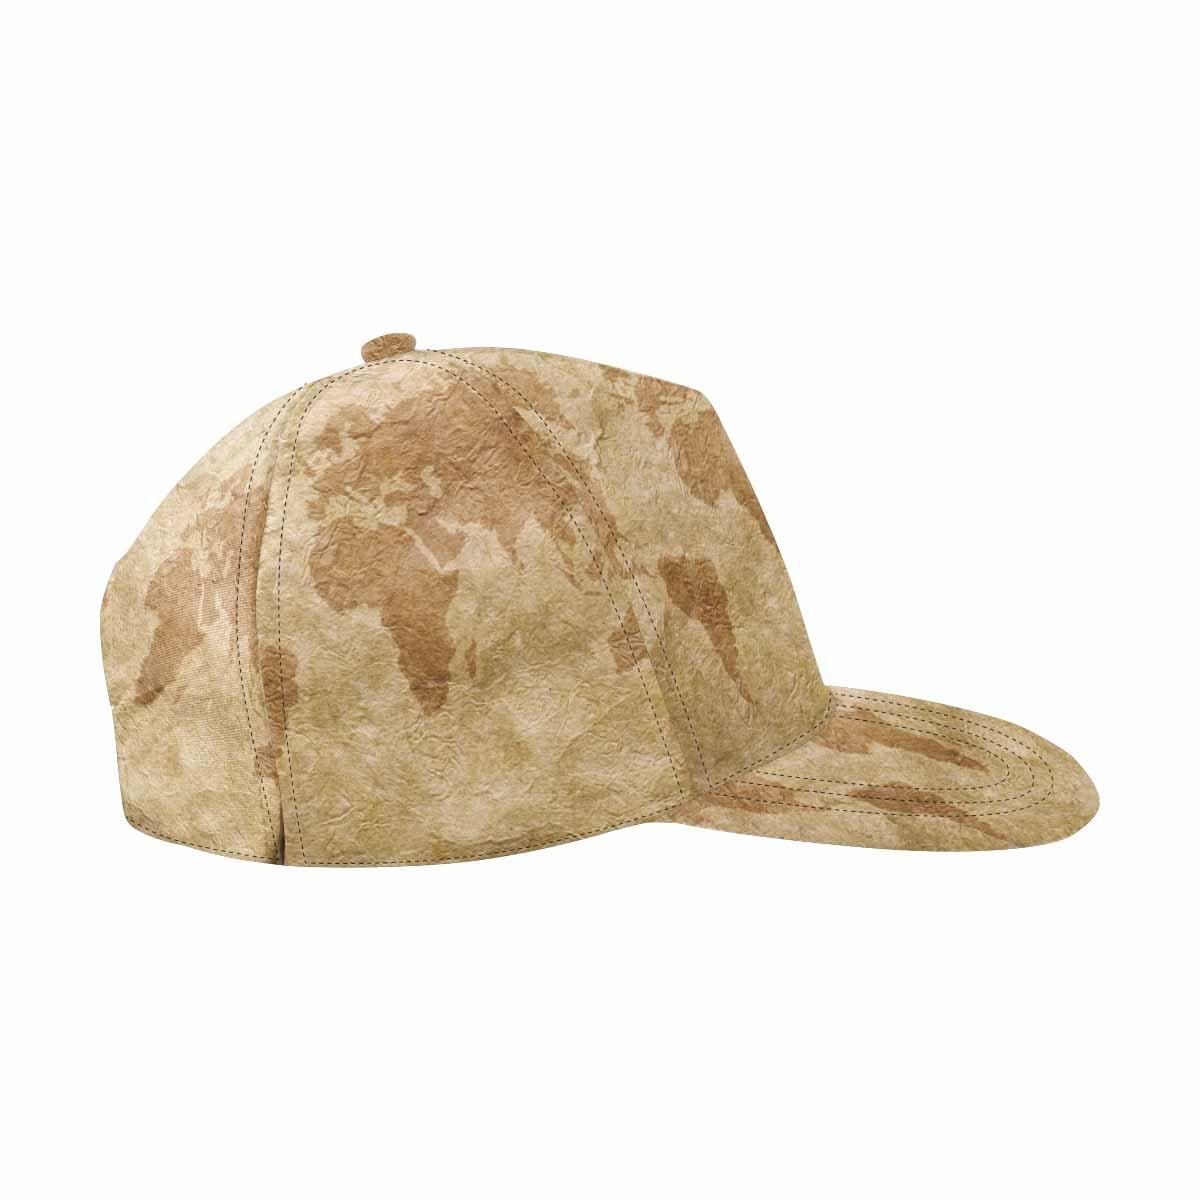 InterestPrint Compass Paper and Wooden Board Unisex Hip Hop Outdoor Sport Snapback Hats